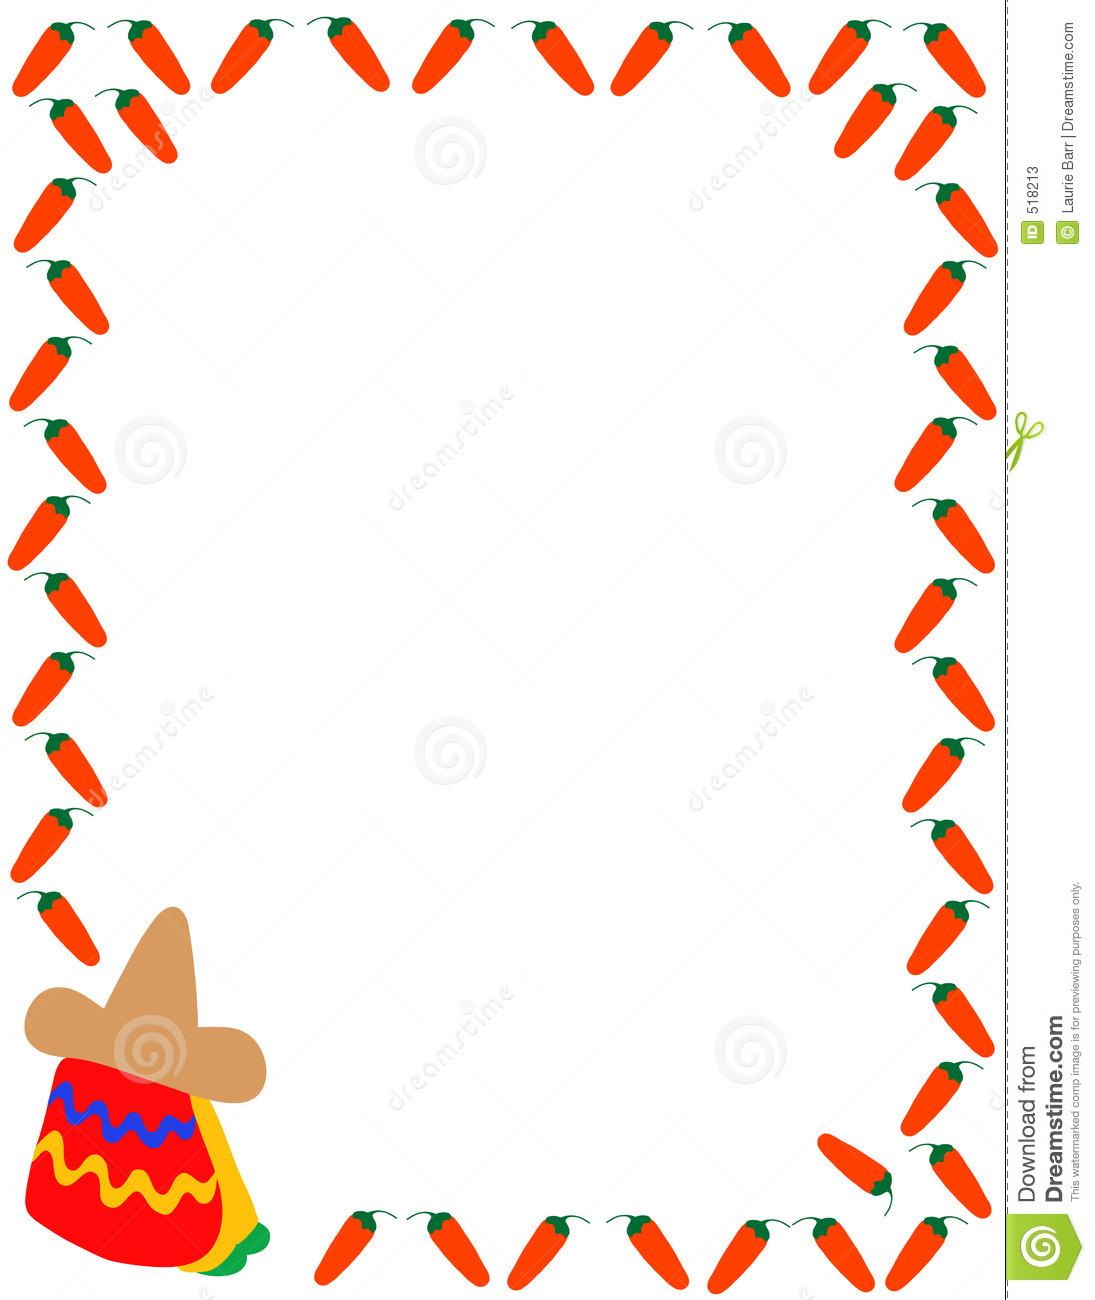 1095x1300 Free Pizza Border Clip Art